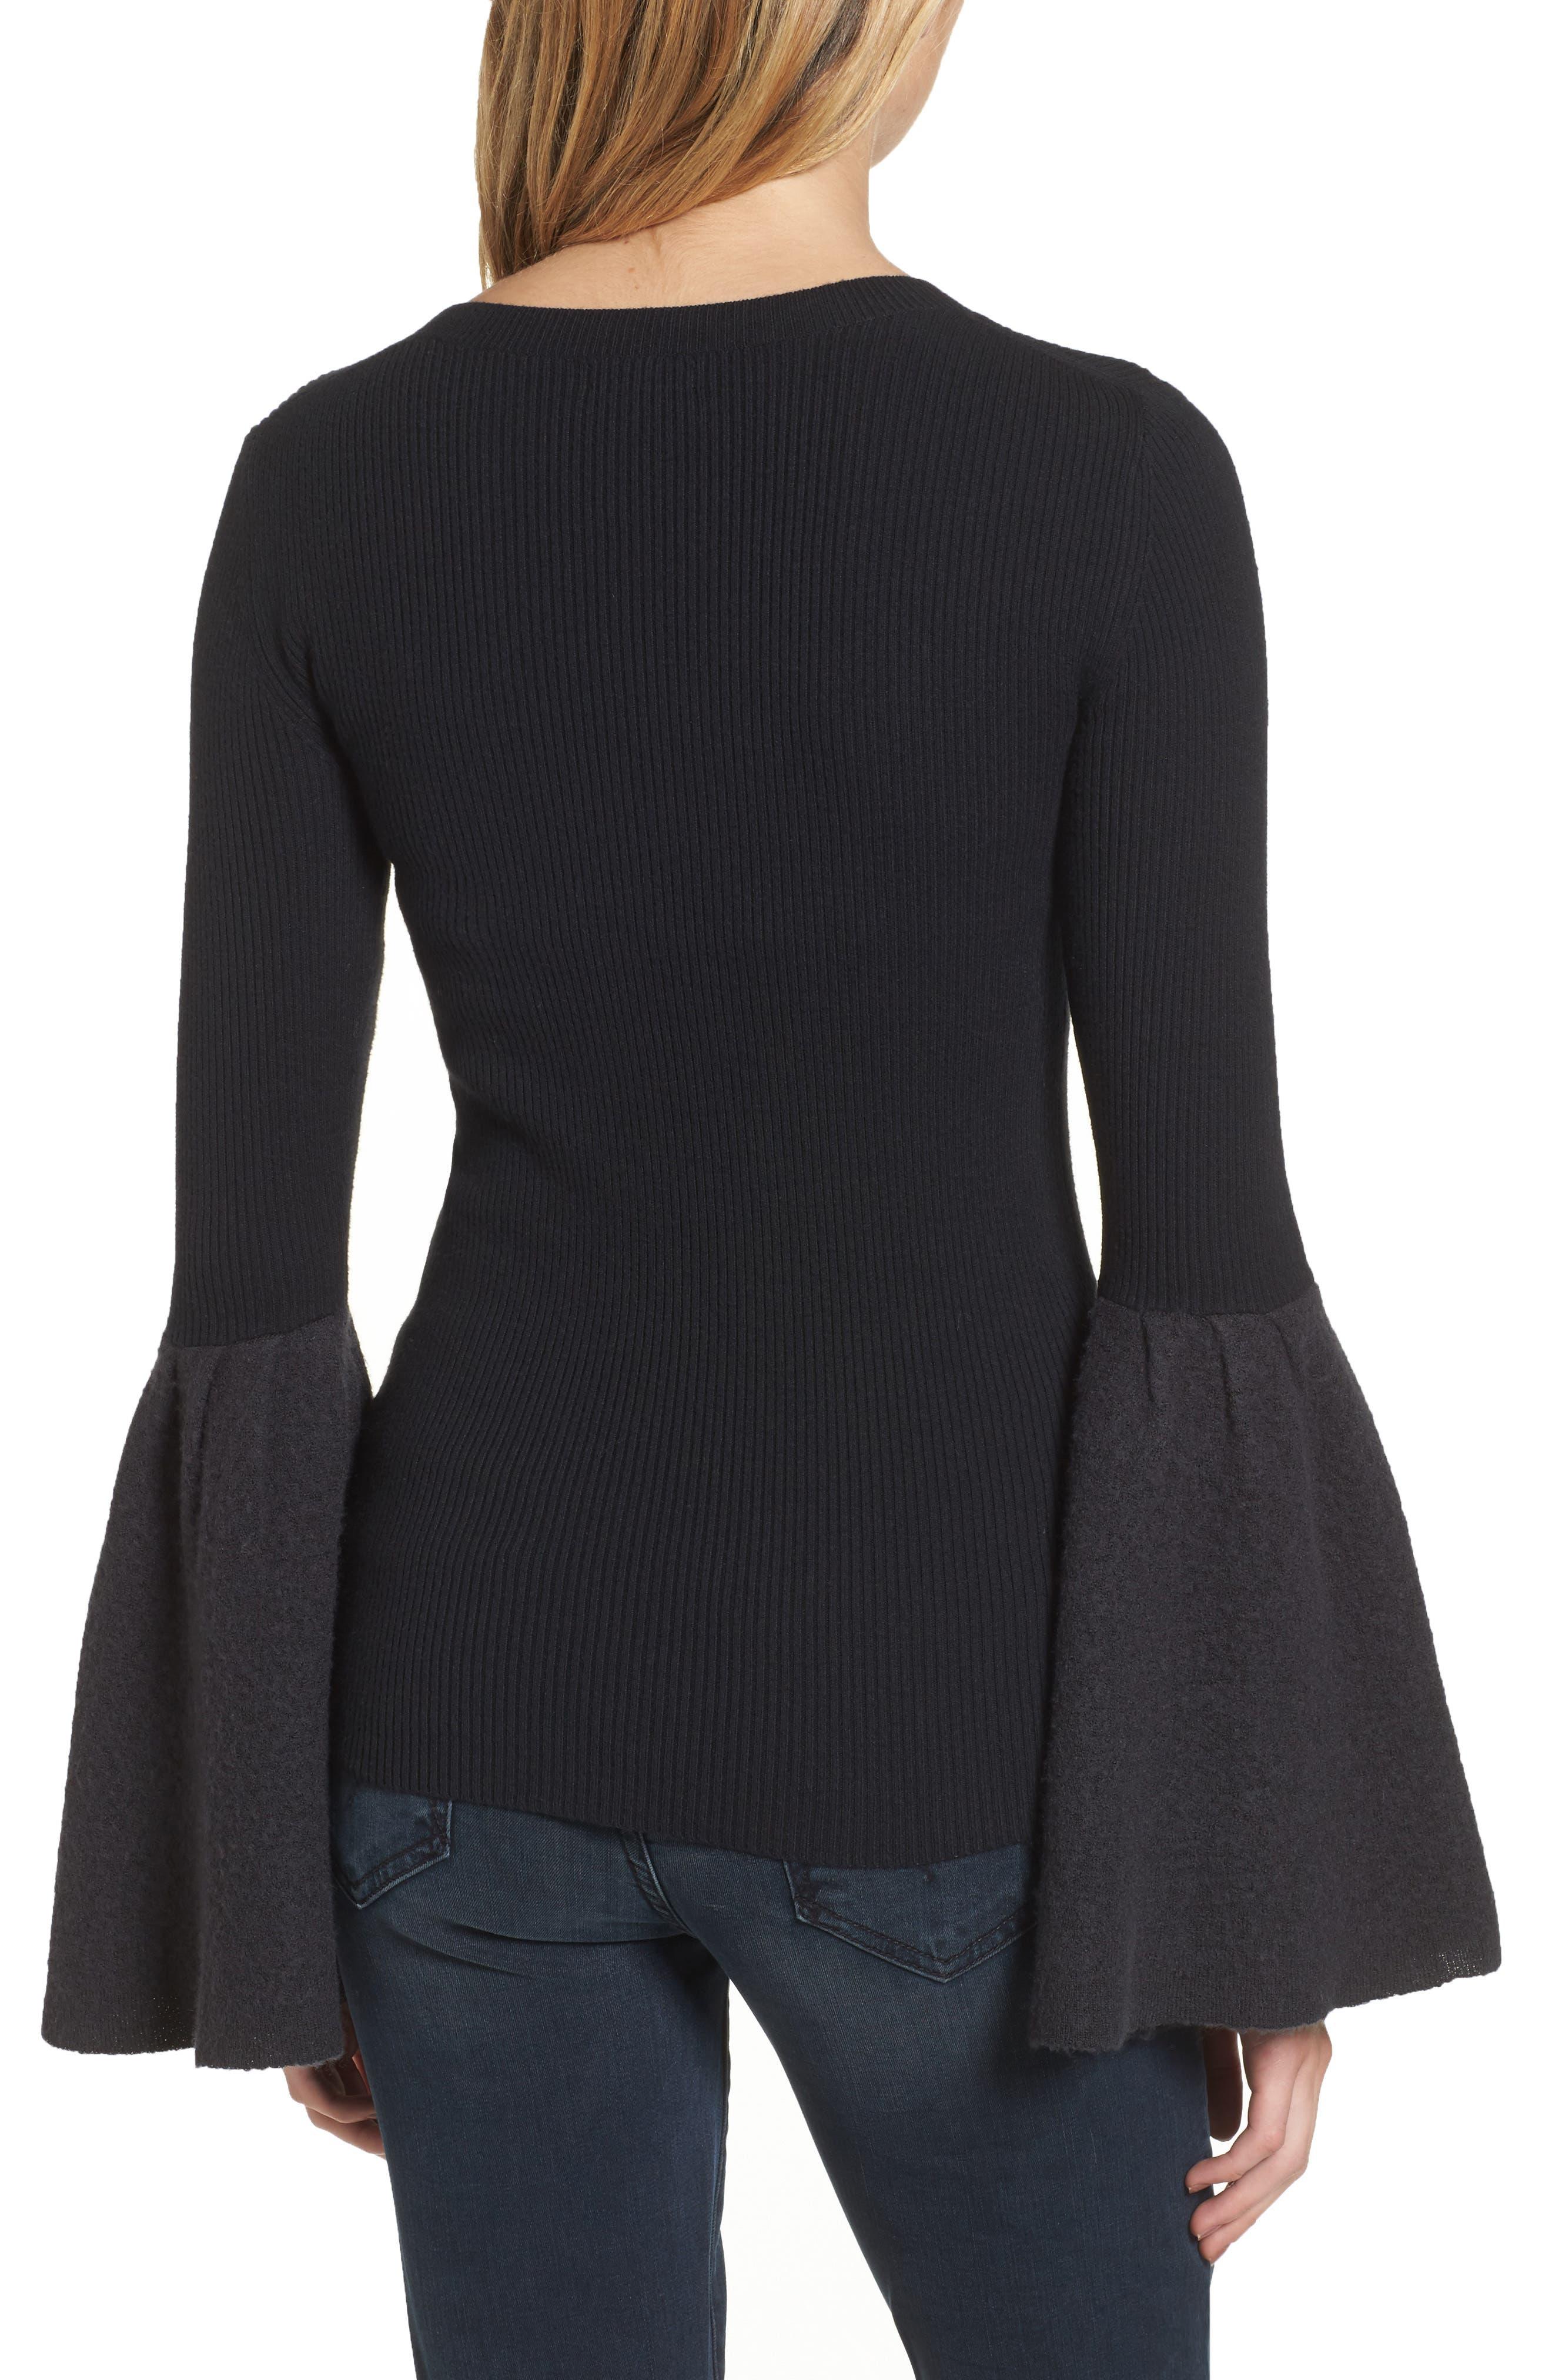 Bell Sleeve Sweater,                             Alternate thumbnail 2, color,                             Black- Grey Dark Heather Combo